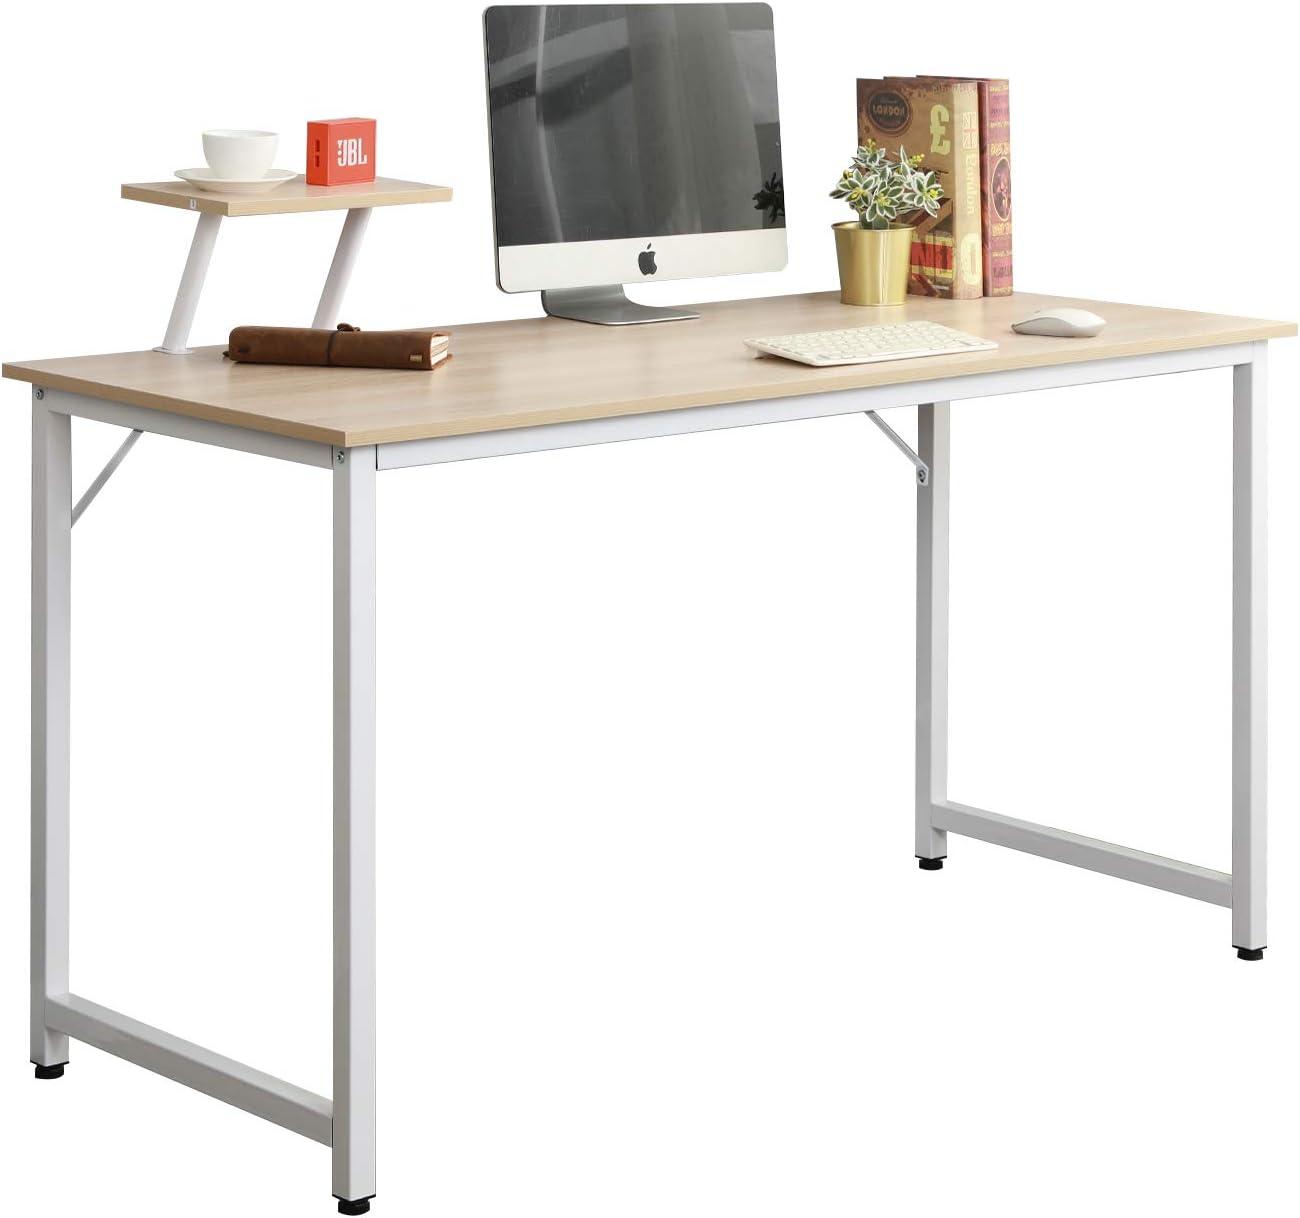 SDHYL Elegant 47.2 inches Ranking TOP10 Computer Desk Office Large La Home Workstation